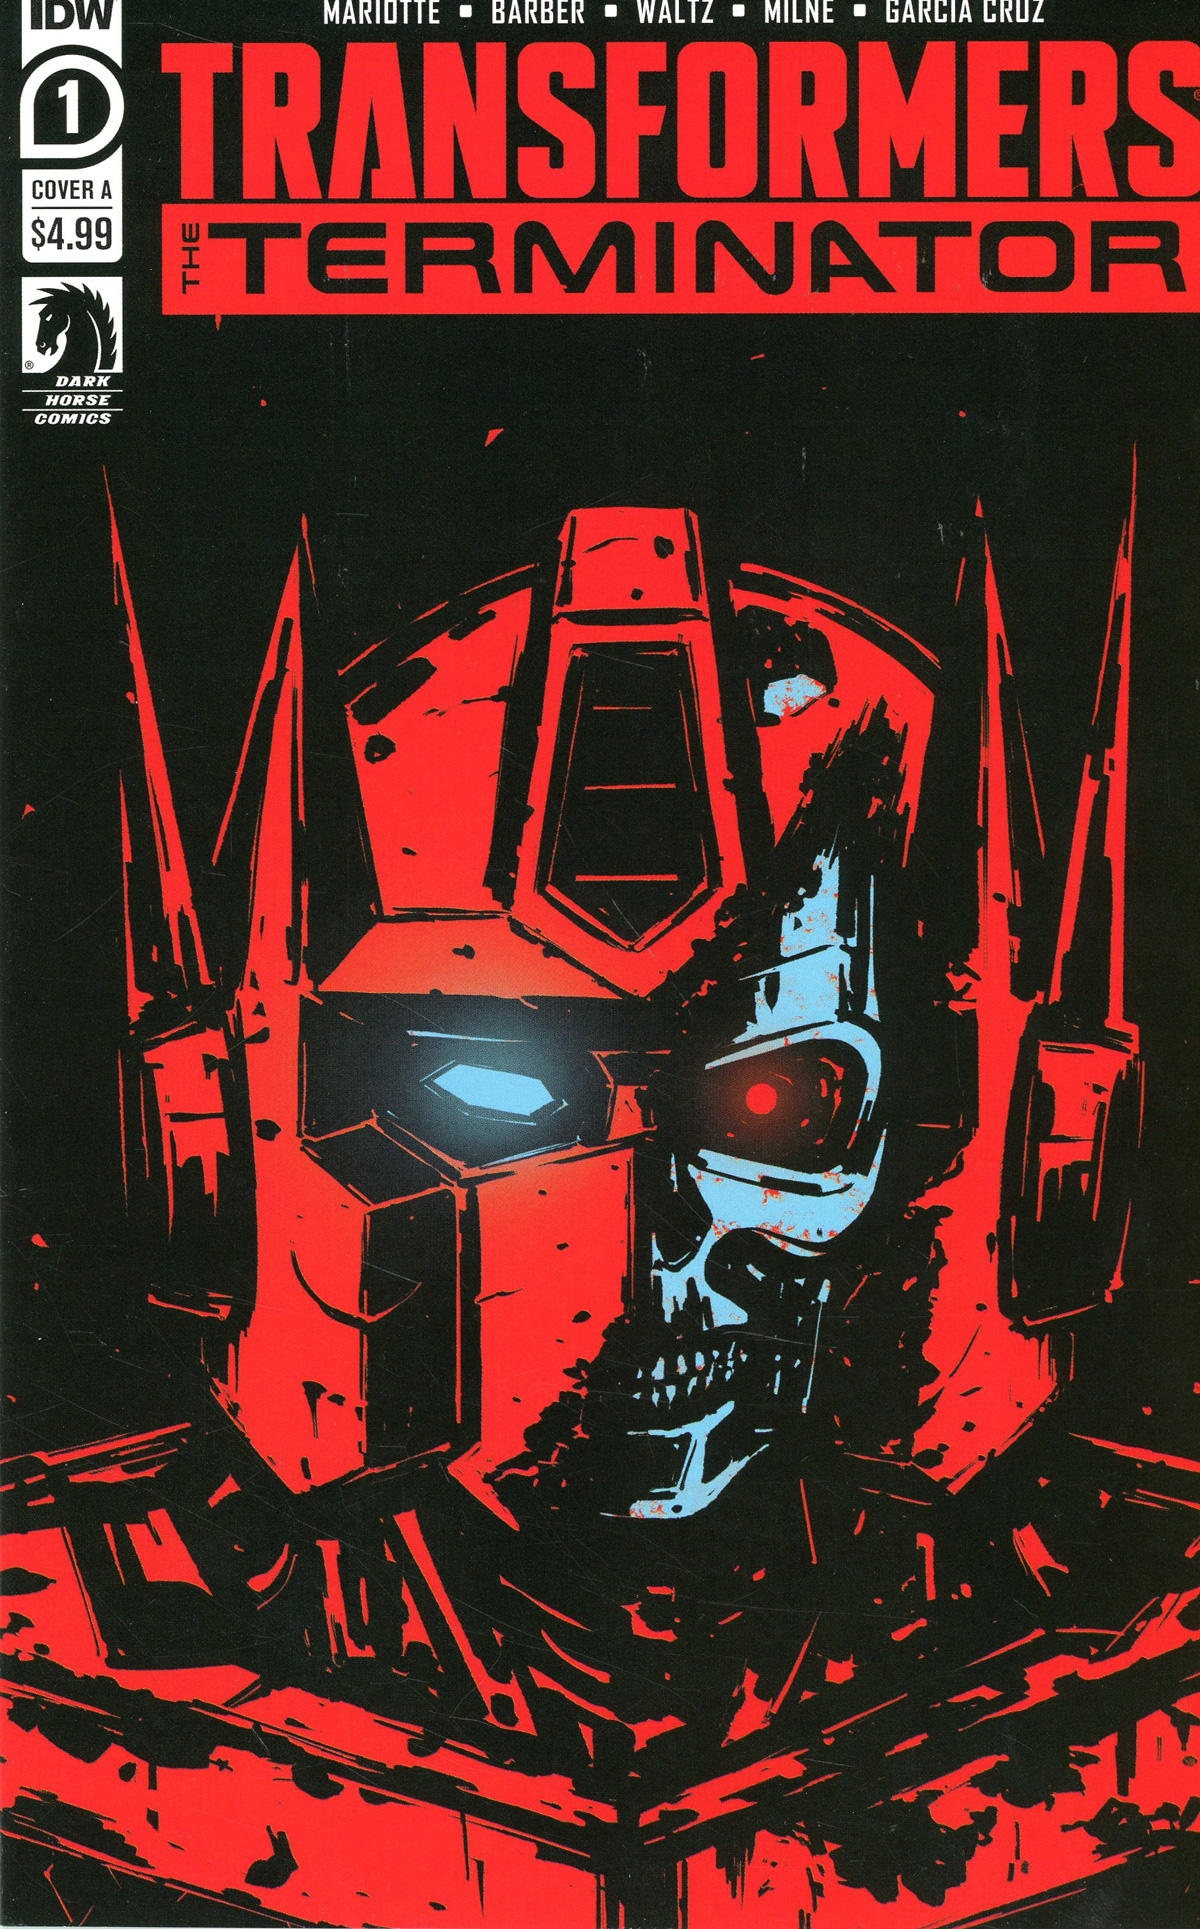 Transformers vs Terminator #1 Cover A Regular Gavin Fullerton Cover